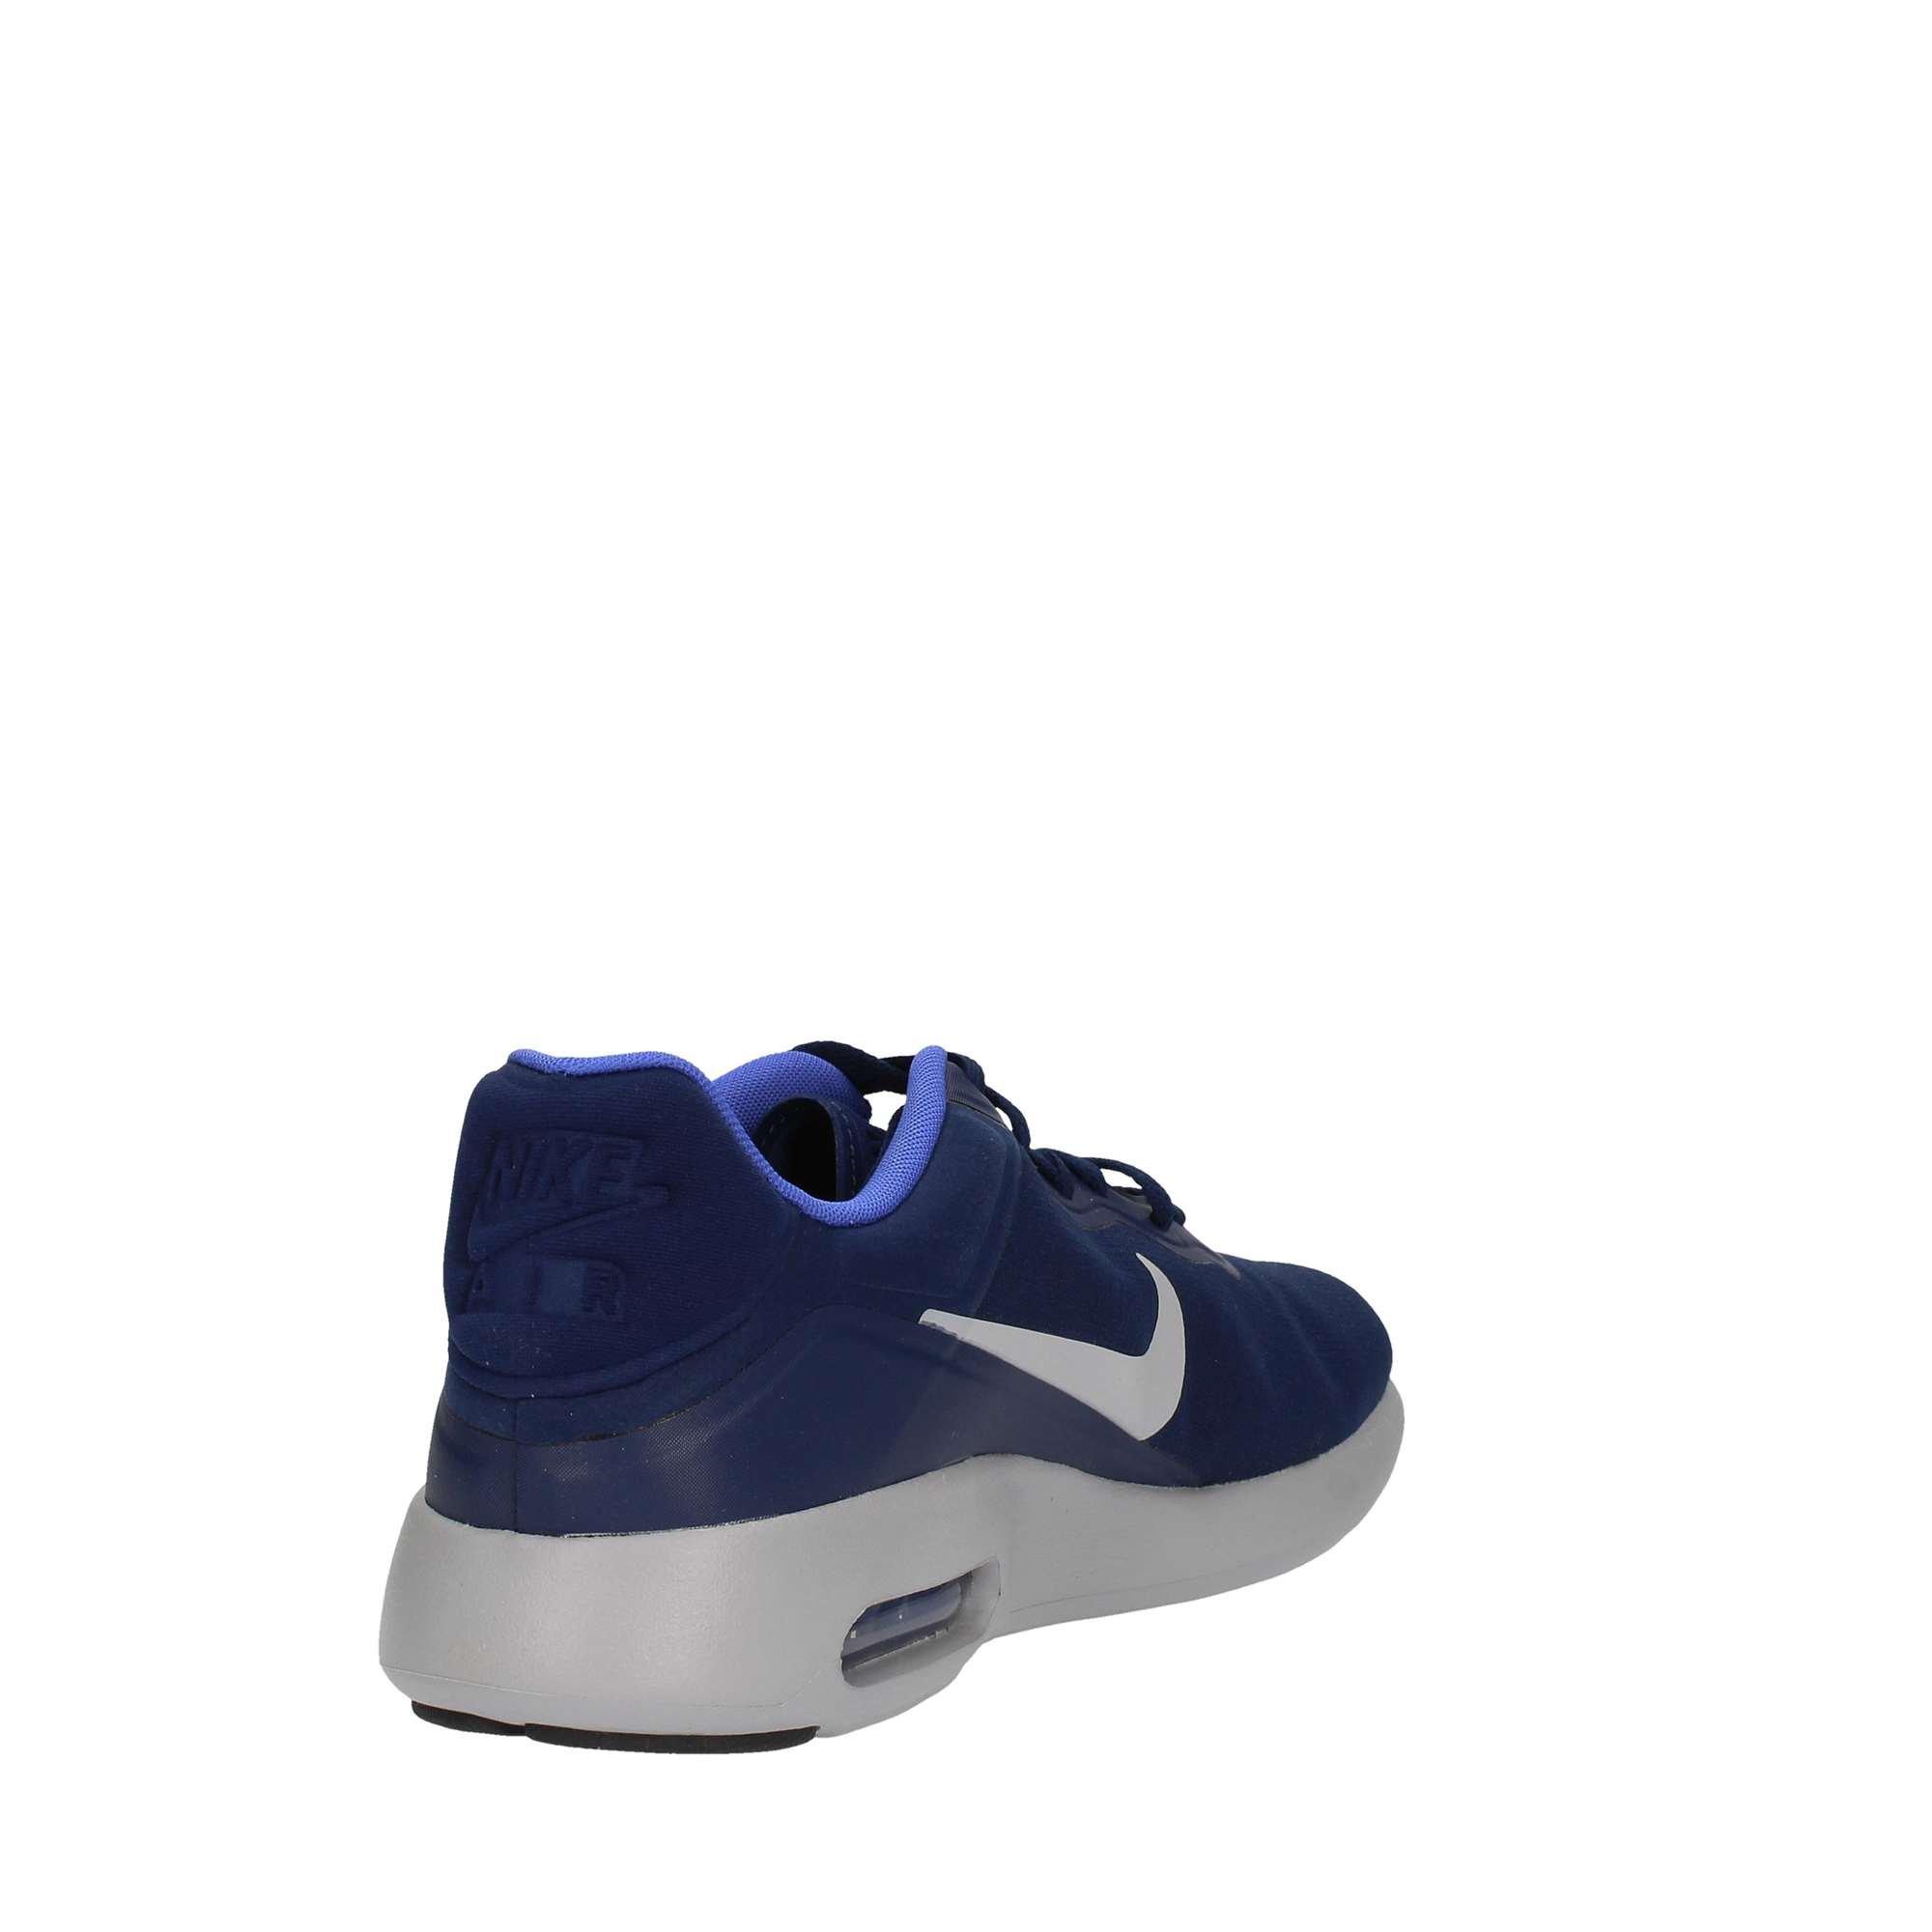 NIKE 844874-400 Sneakers Mann Blau 42½